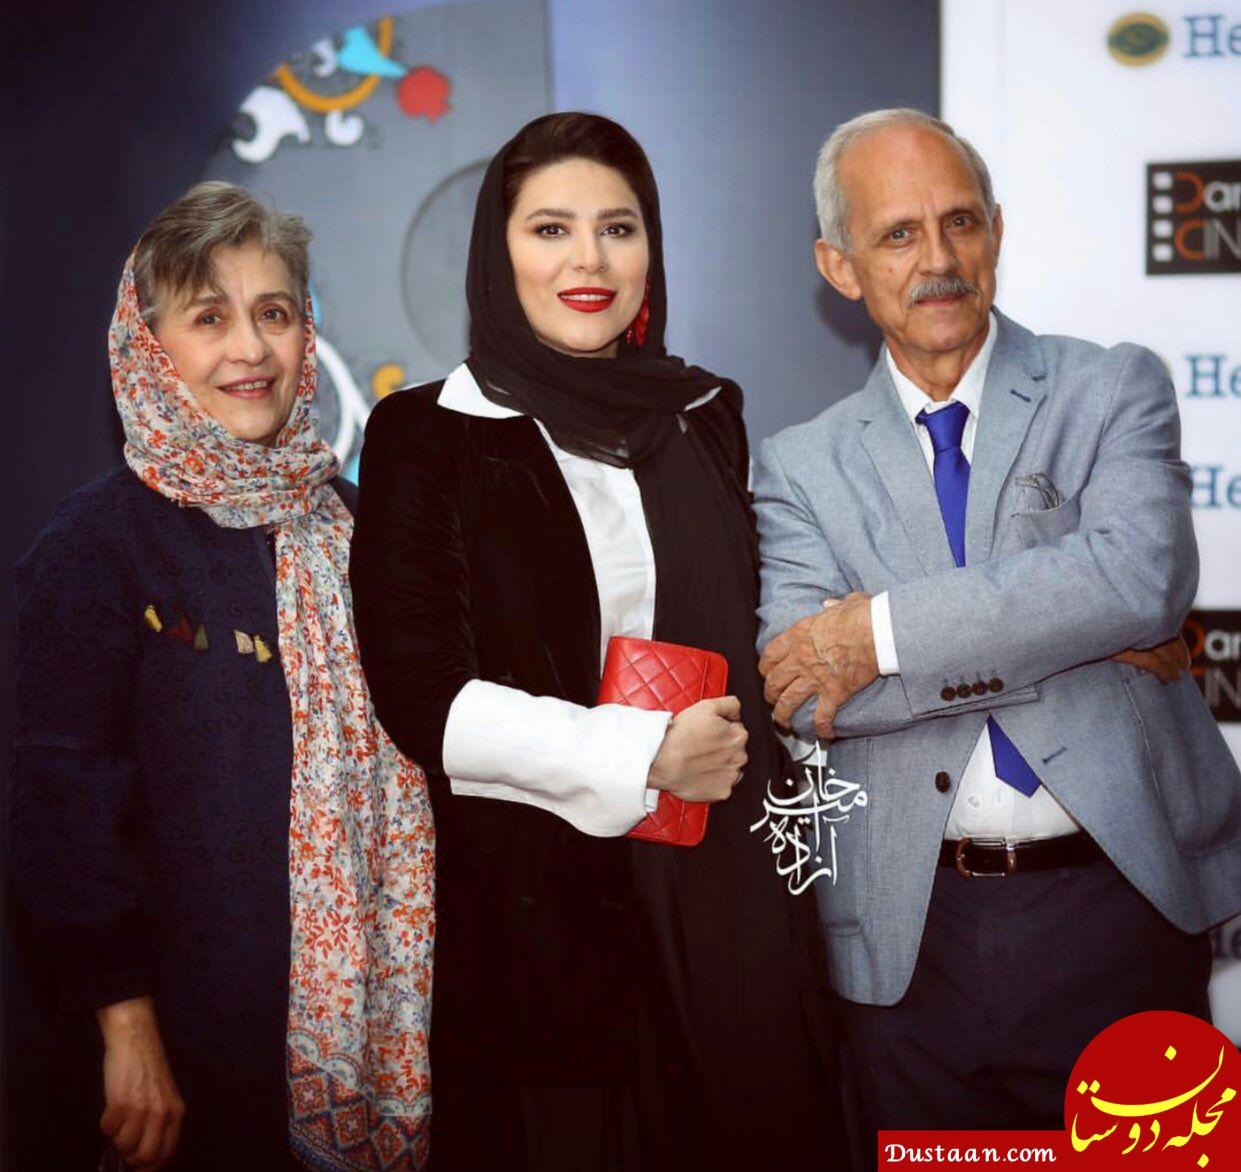 www.dustaan.com بیوگرافی و عکس های دیدنی سحر دولتشاهی / دلیل طلاق از رامبد جوان چه بود؟ +تصاویر